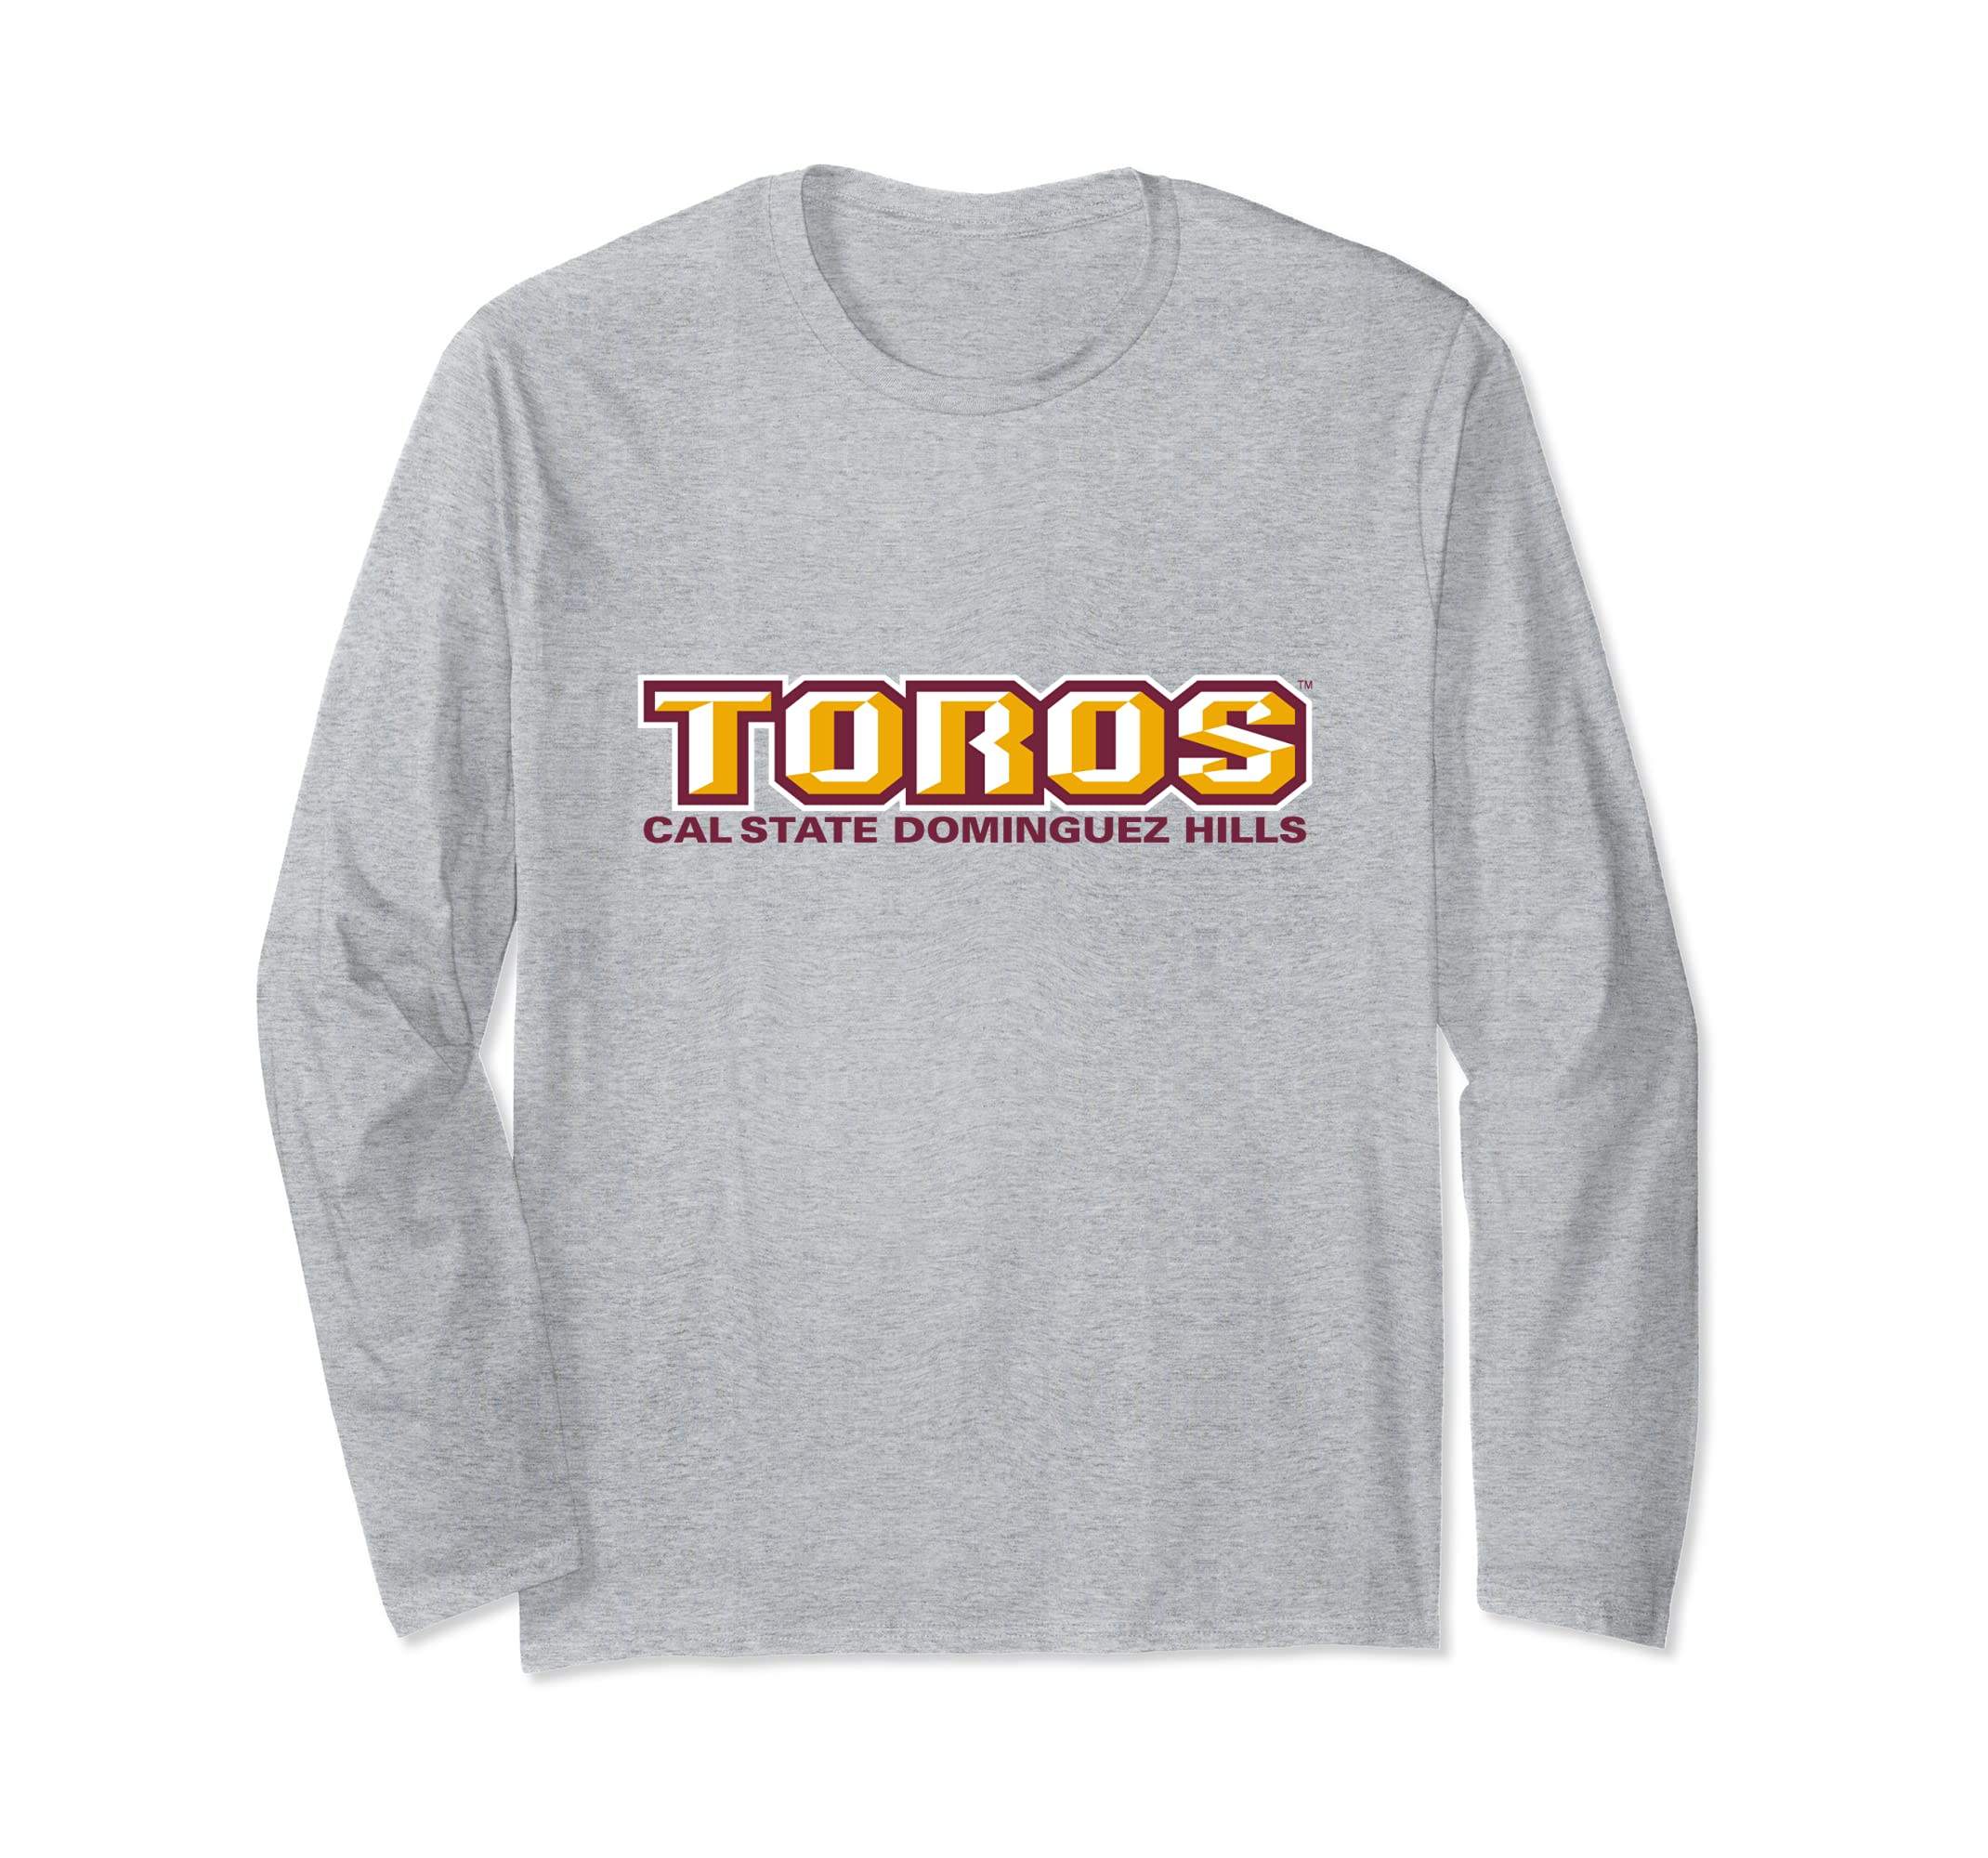 Cal State Dominguez HIlls Toros College Long Sleeve PPCSD06-Awarplus